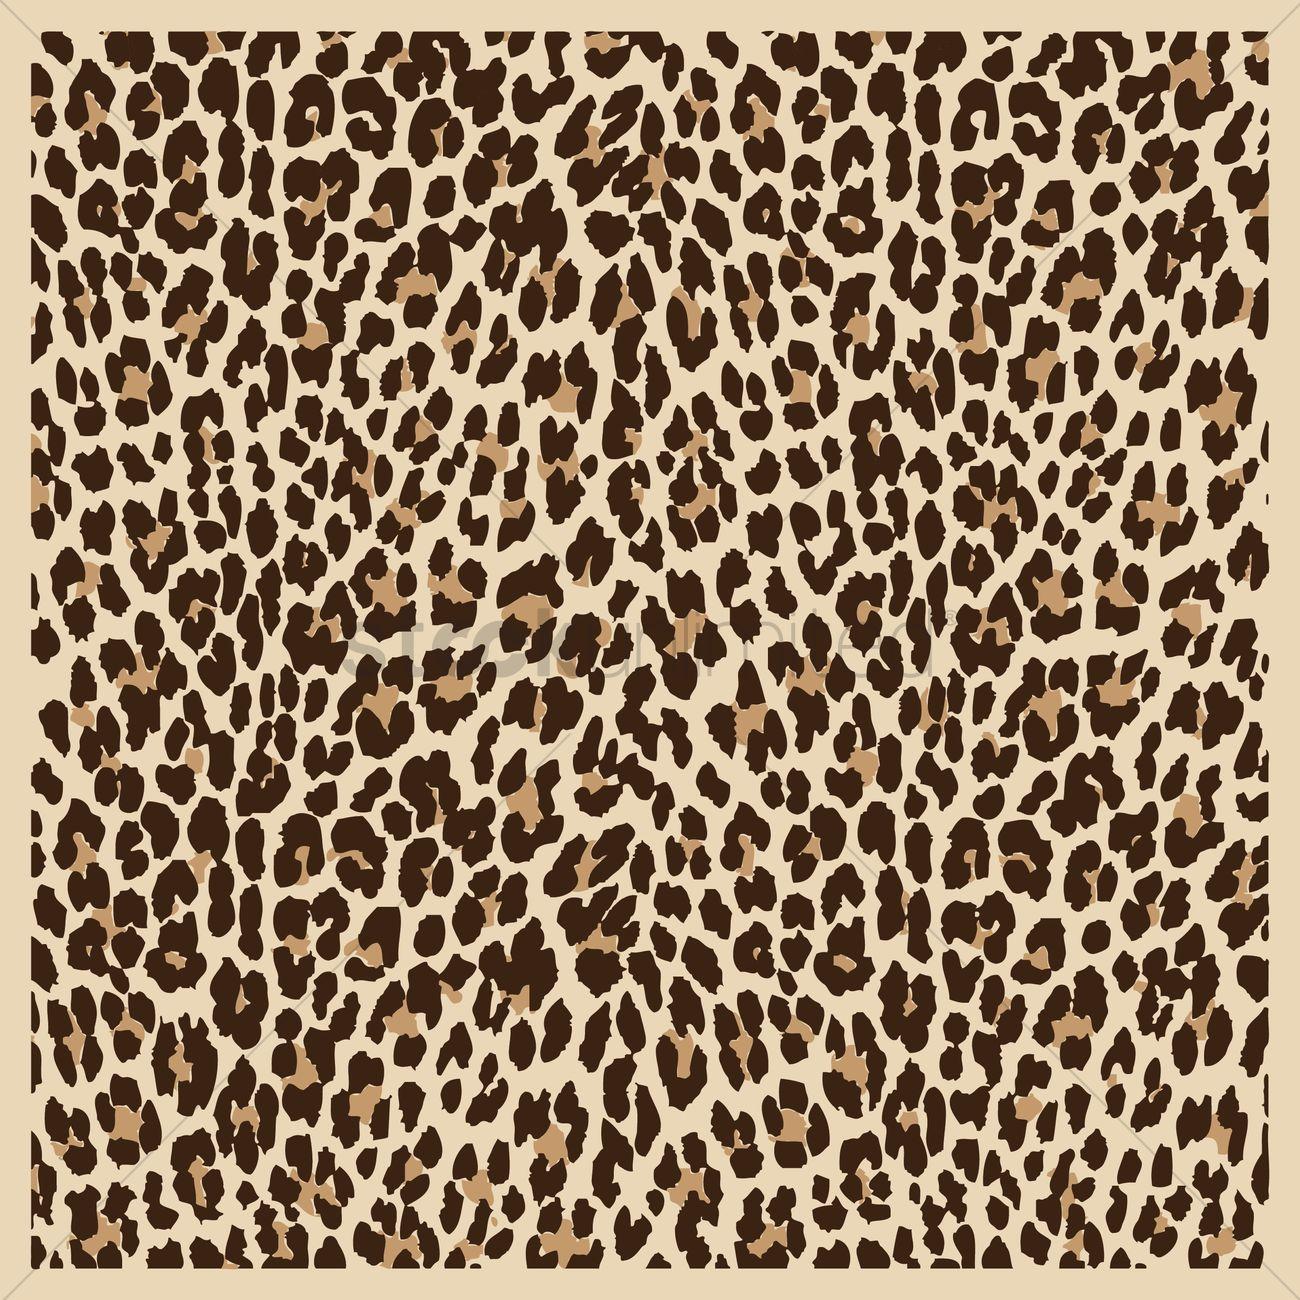 Cheetah skin background Vector Image - 1429838 ...